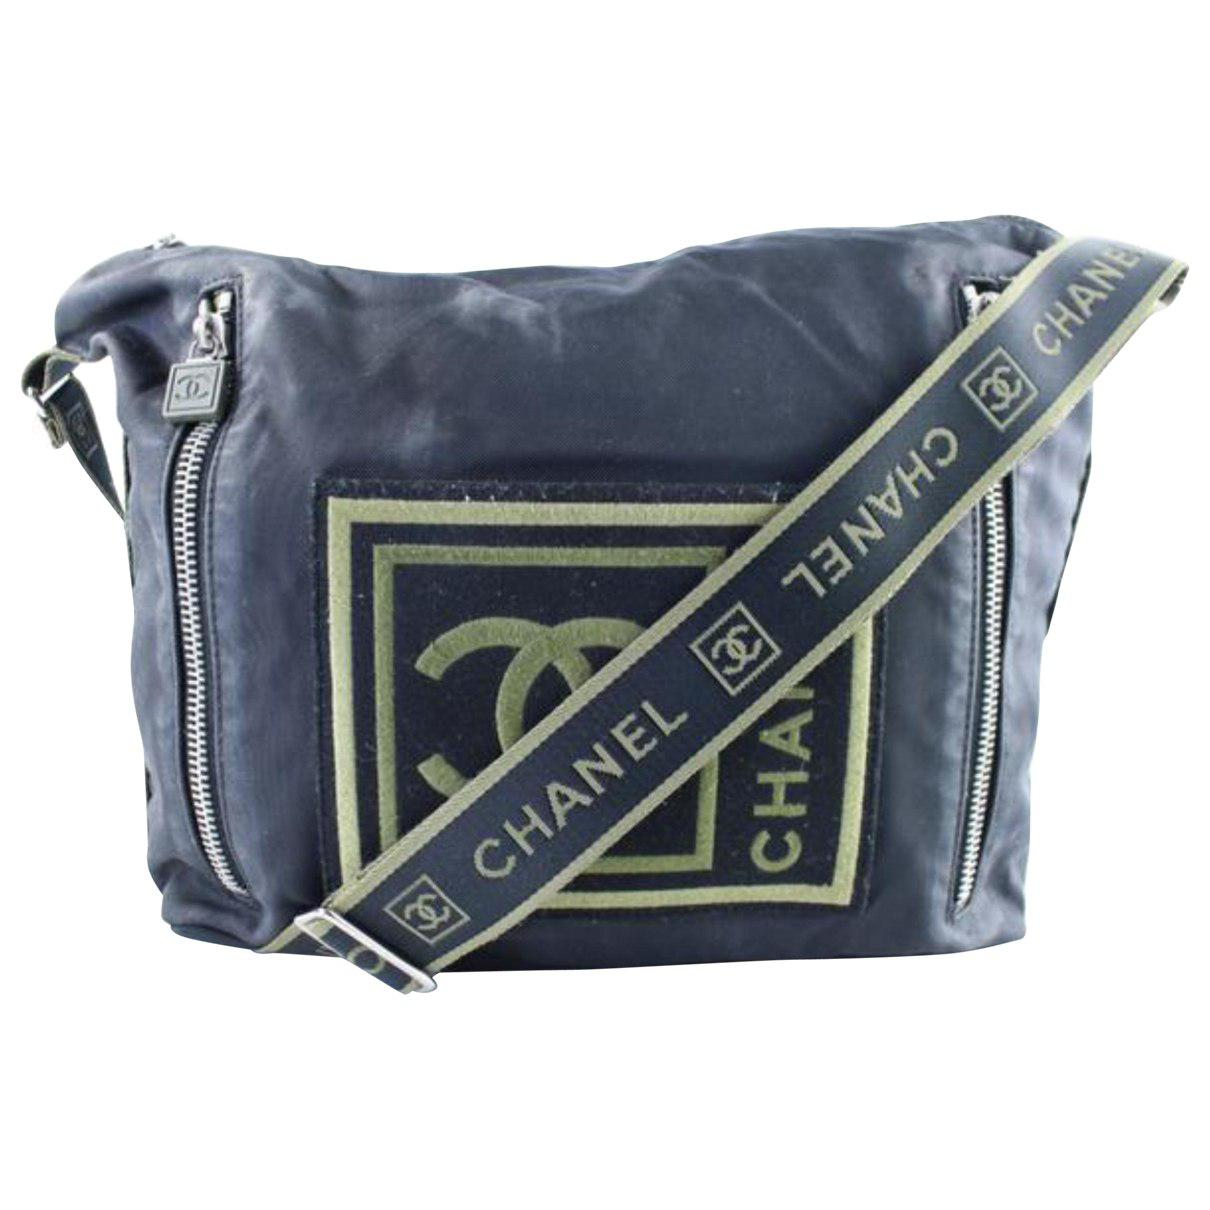 Lyst - Chanel Crossbody Bag in Blue 44be65e7f1d